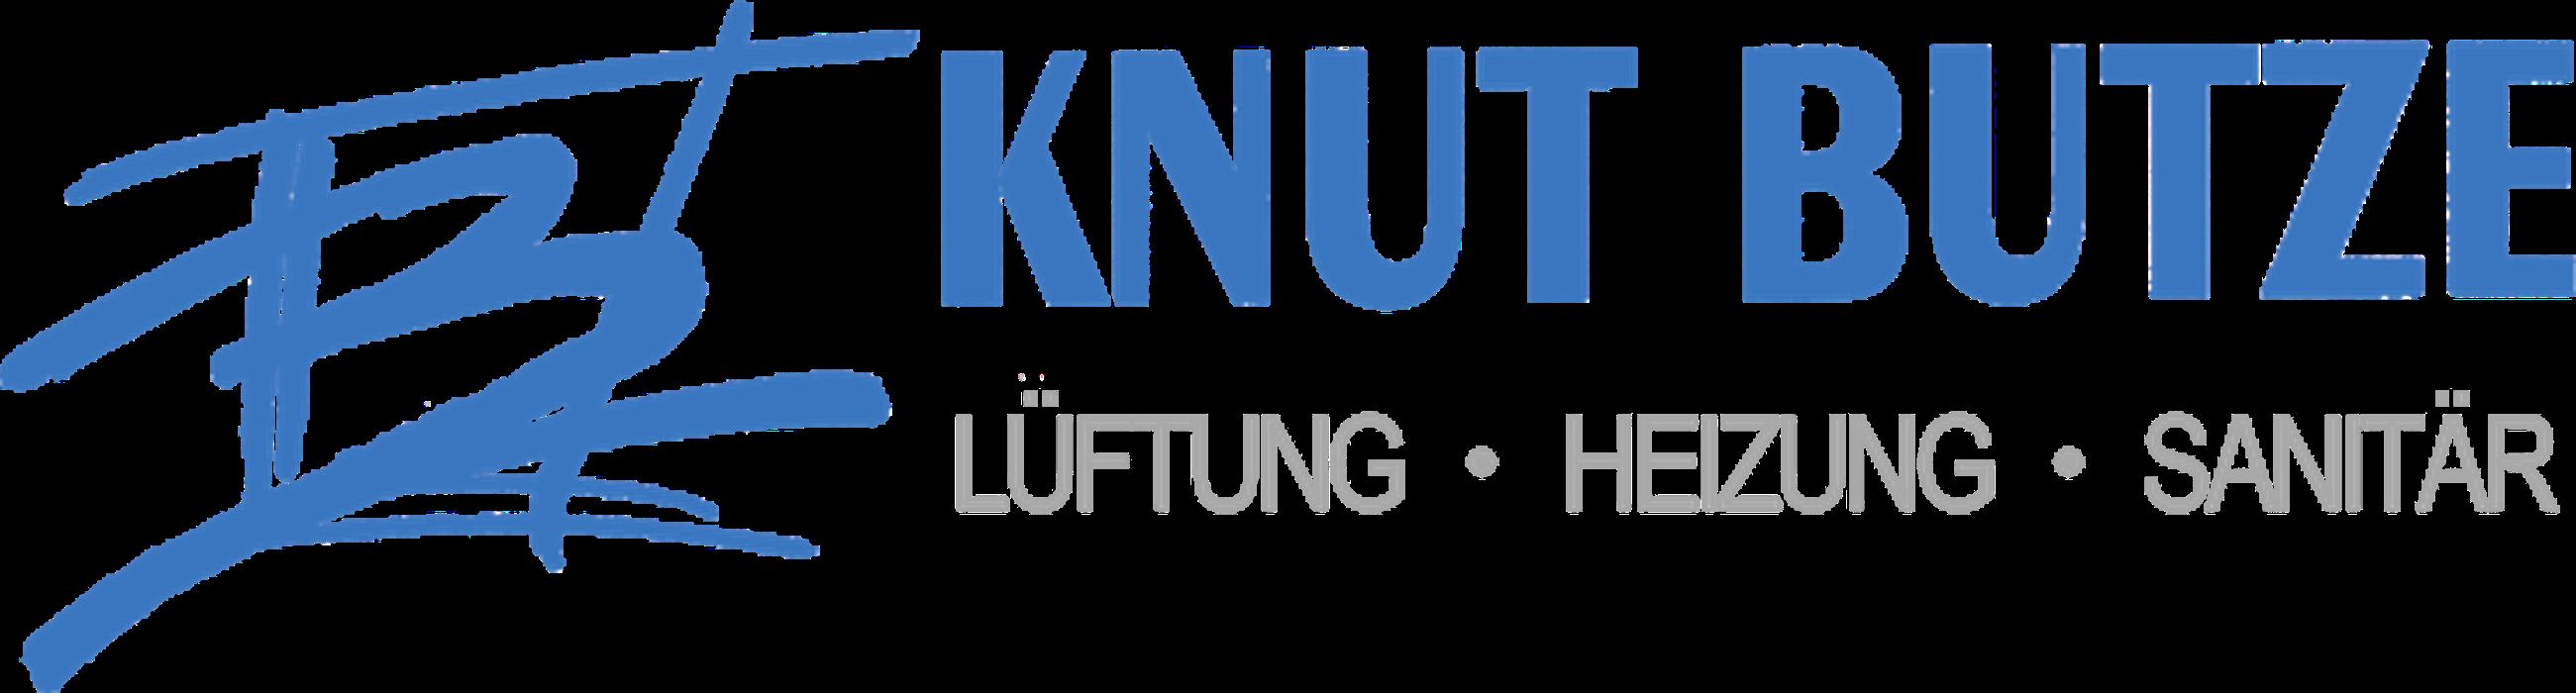 Bild zu Knut Butze GmbH Lüftung Heizung Sanitär in Königs Wusterhausen